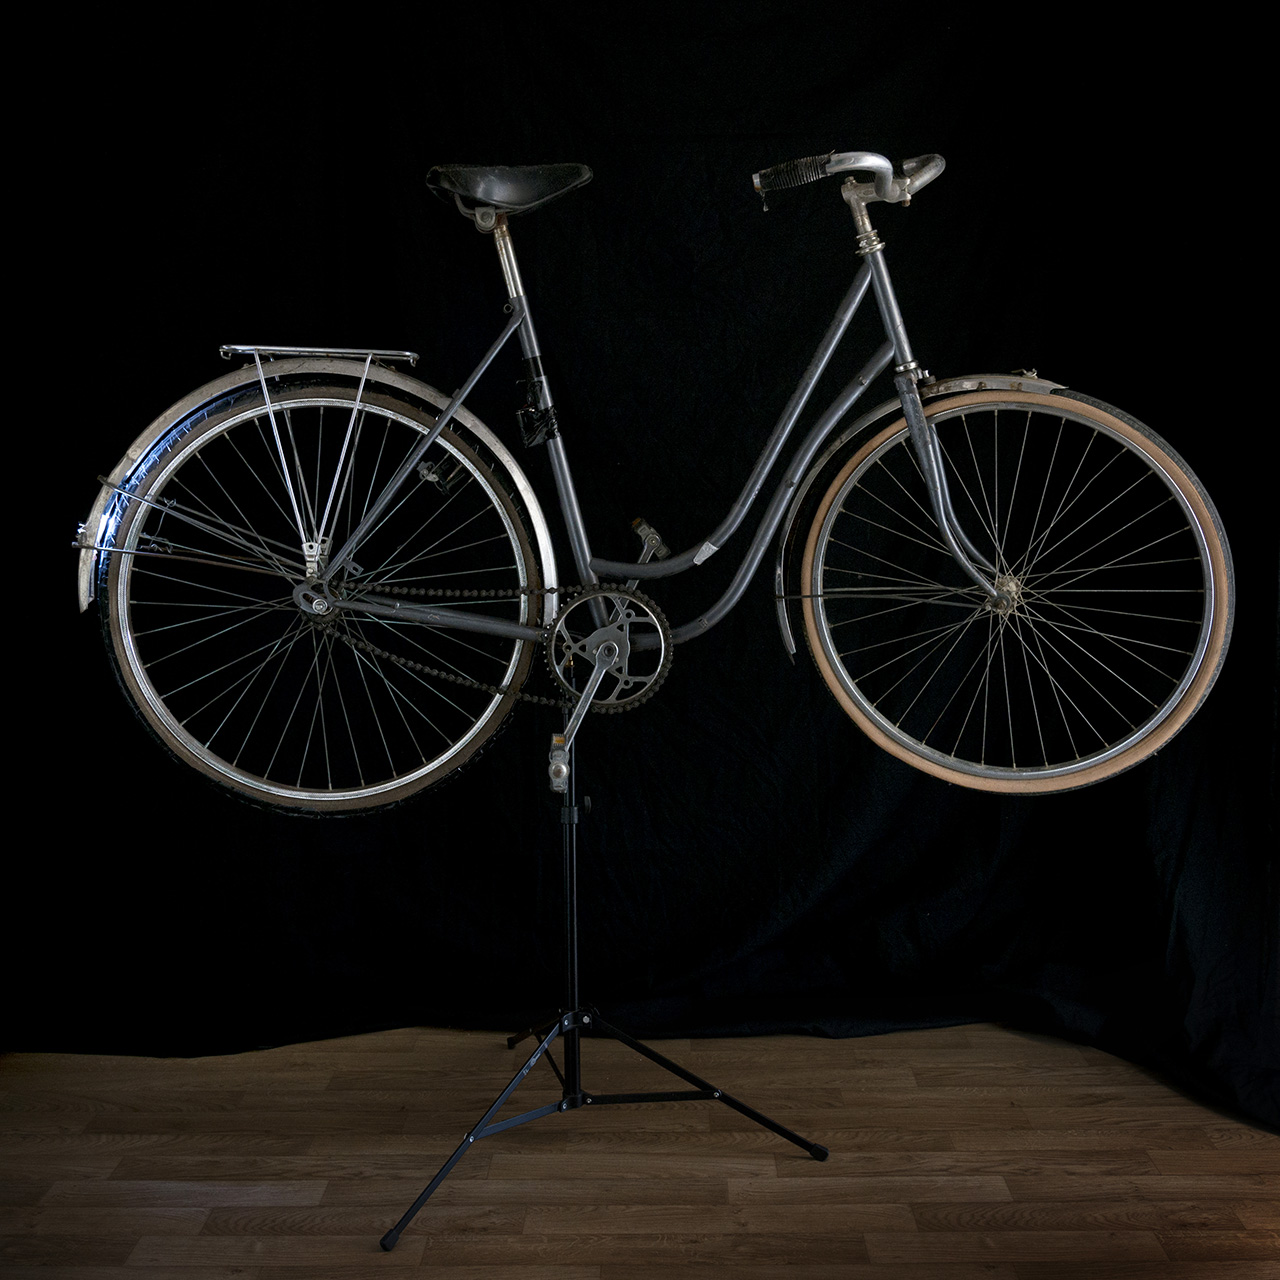 Bicycloscope